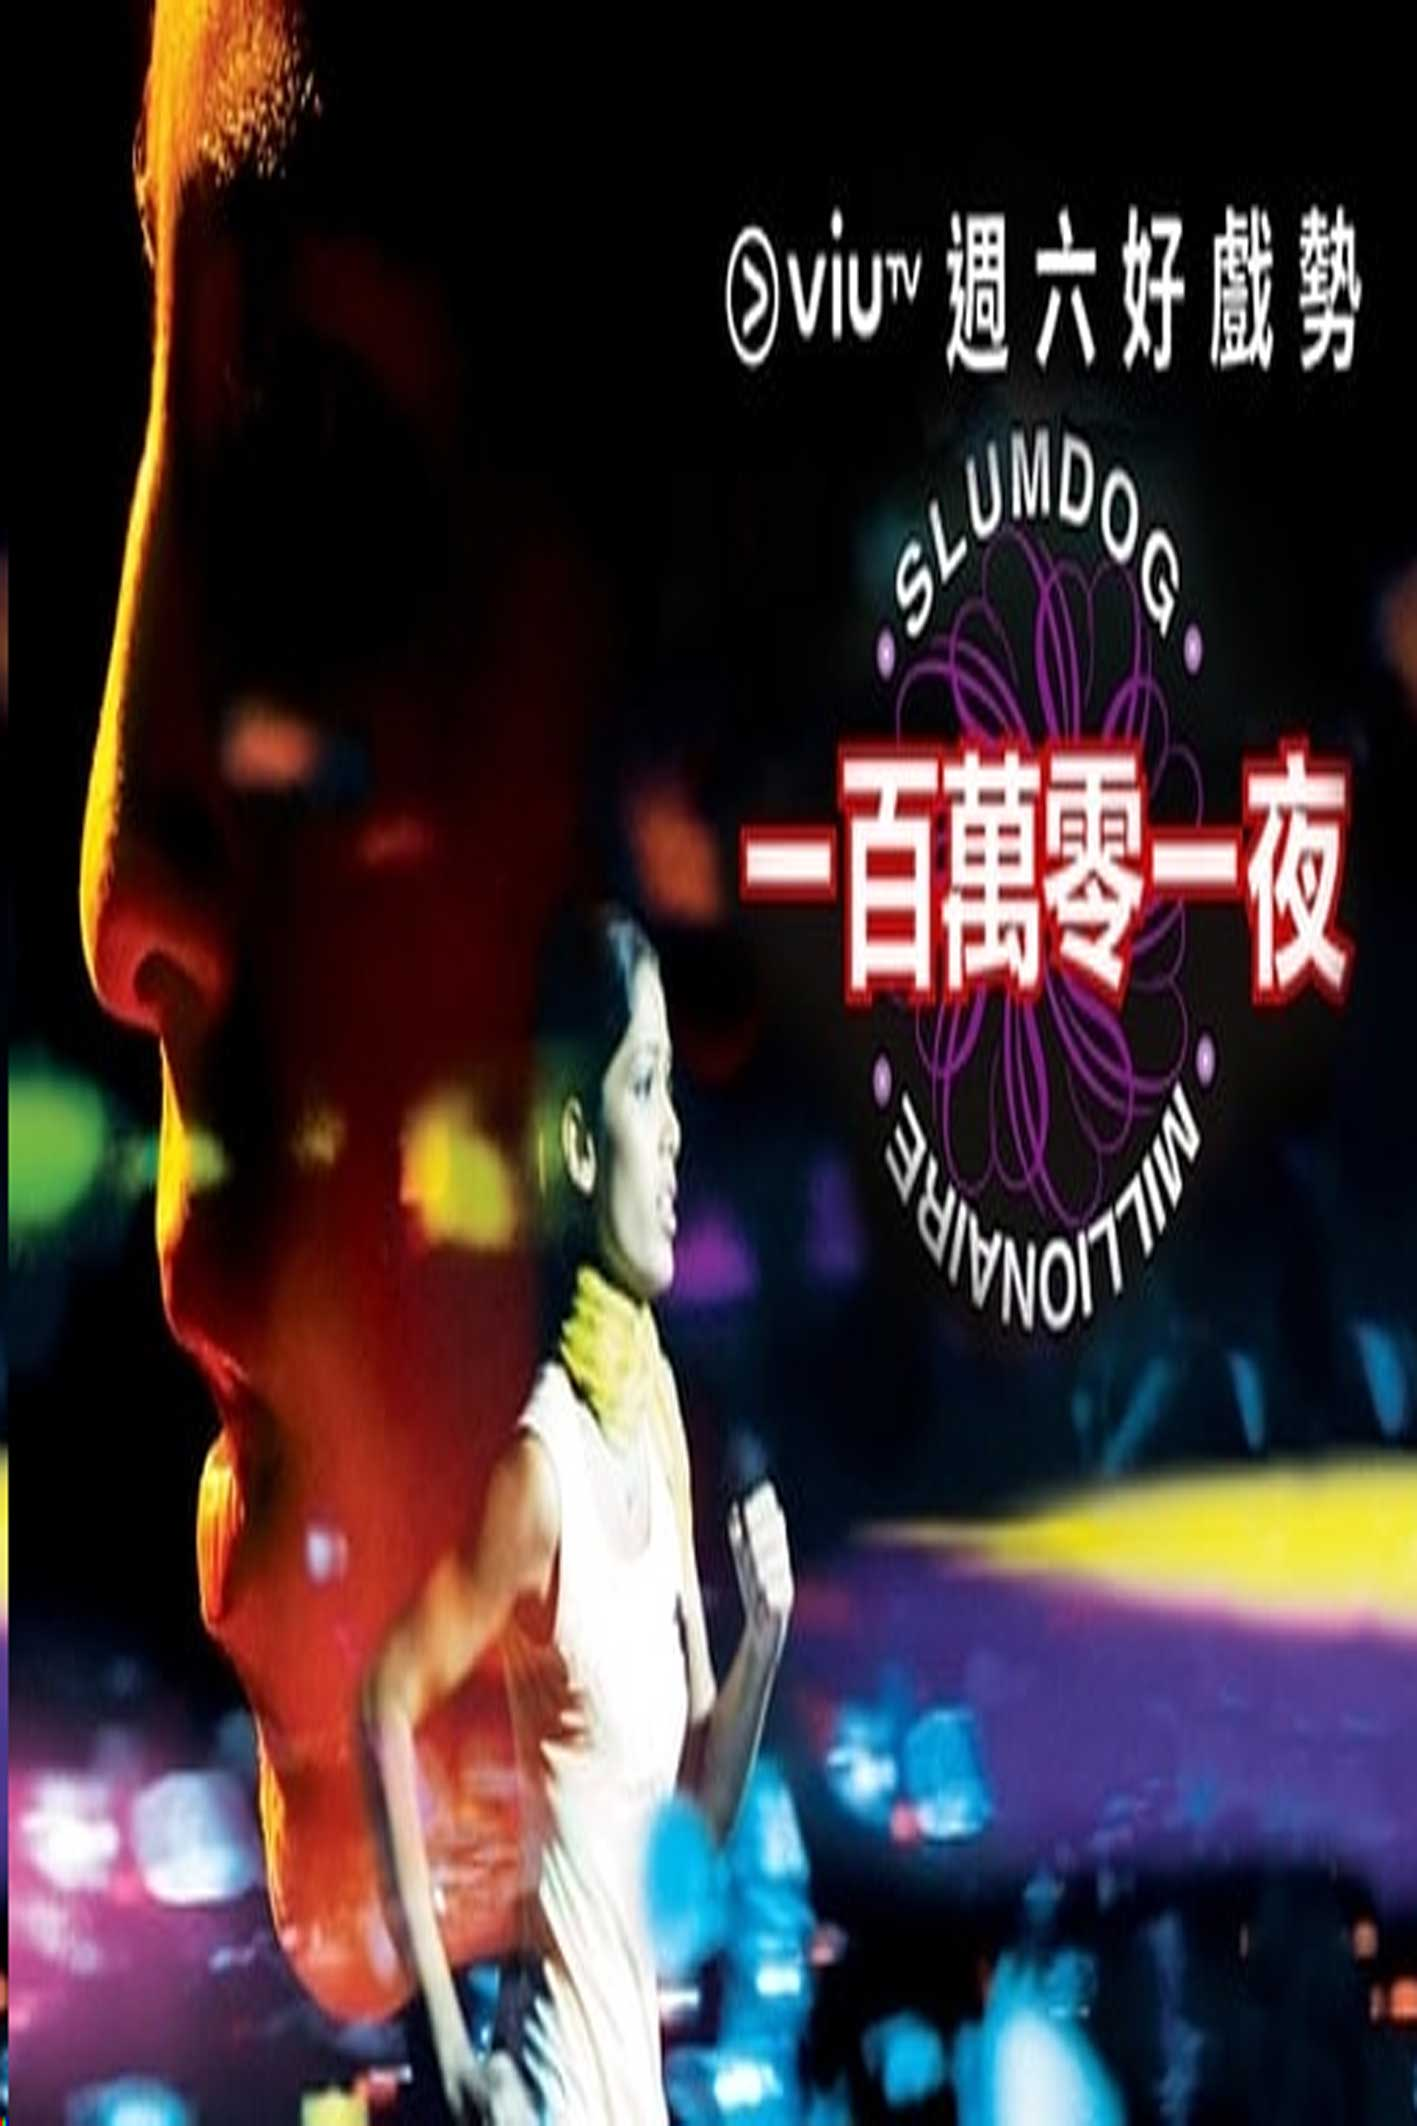 Slumdog Millionaire (Cantonese) - 一百萬零一夜